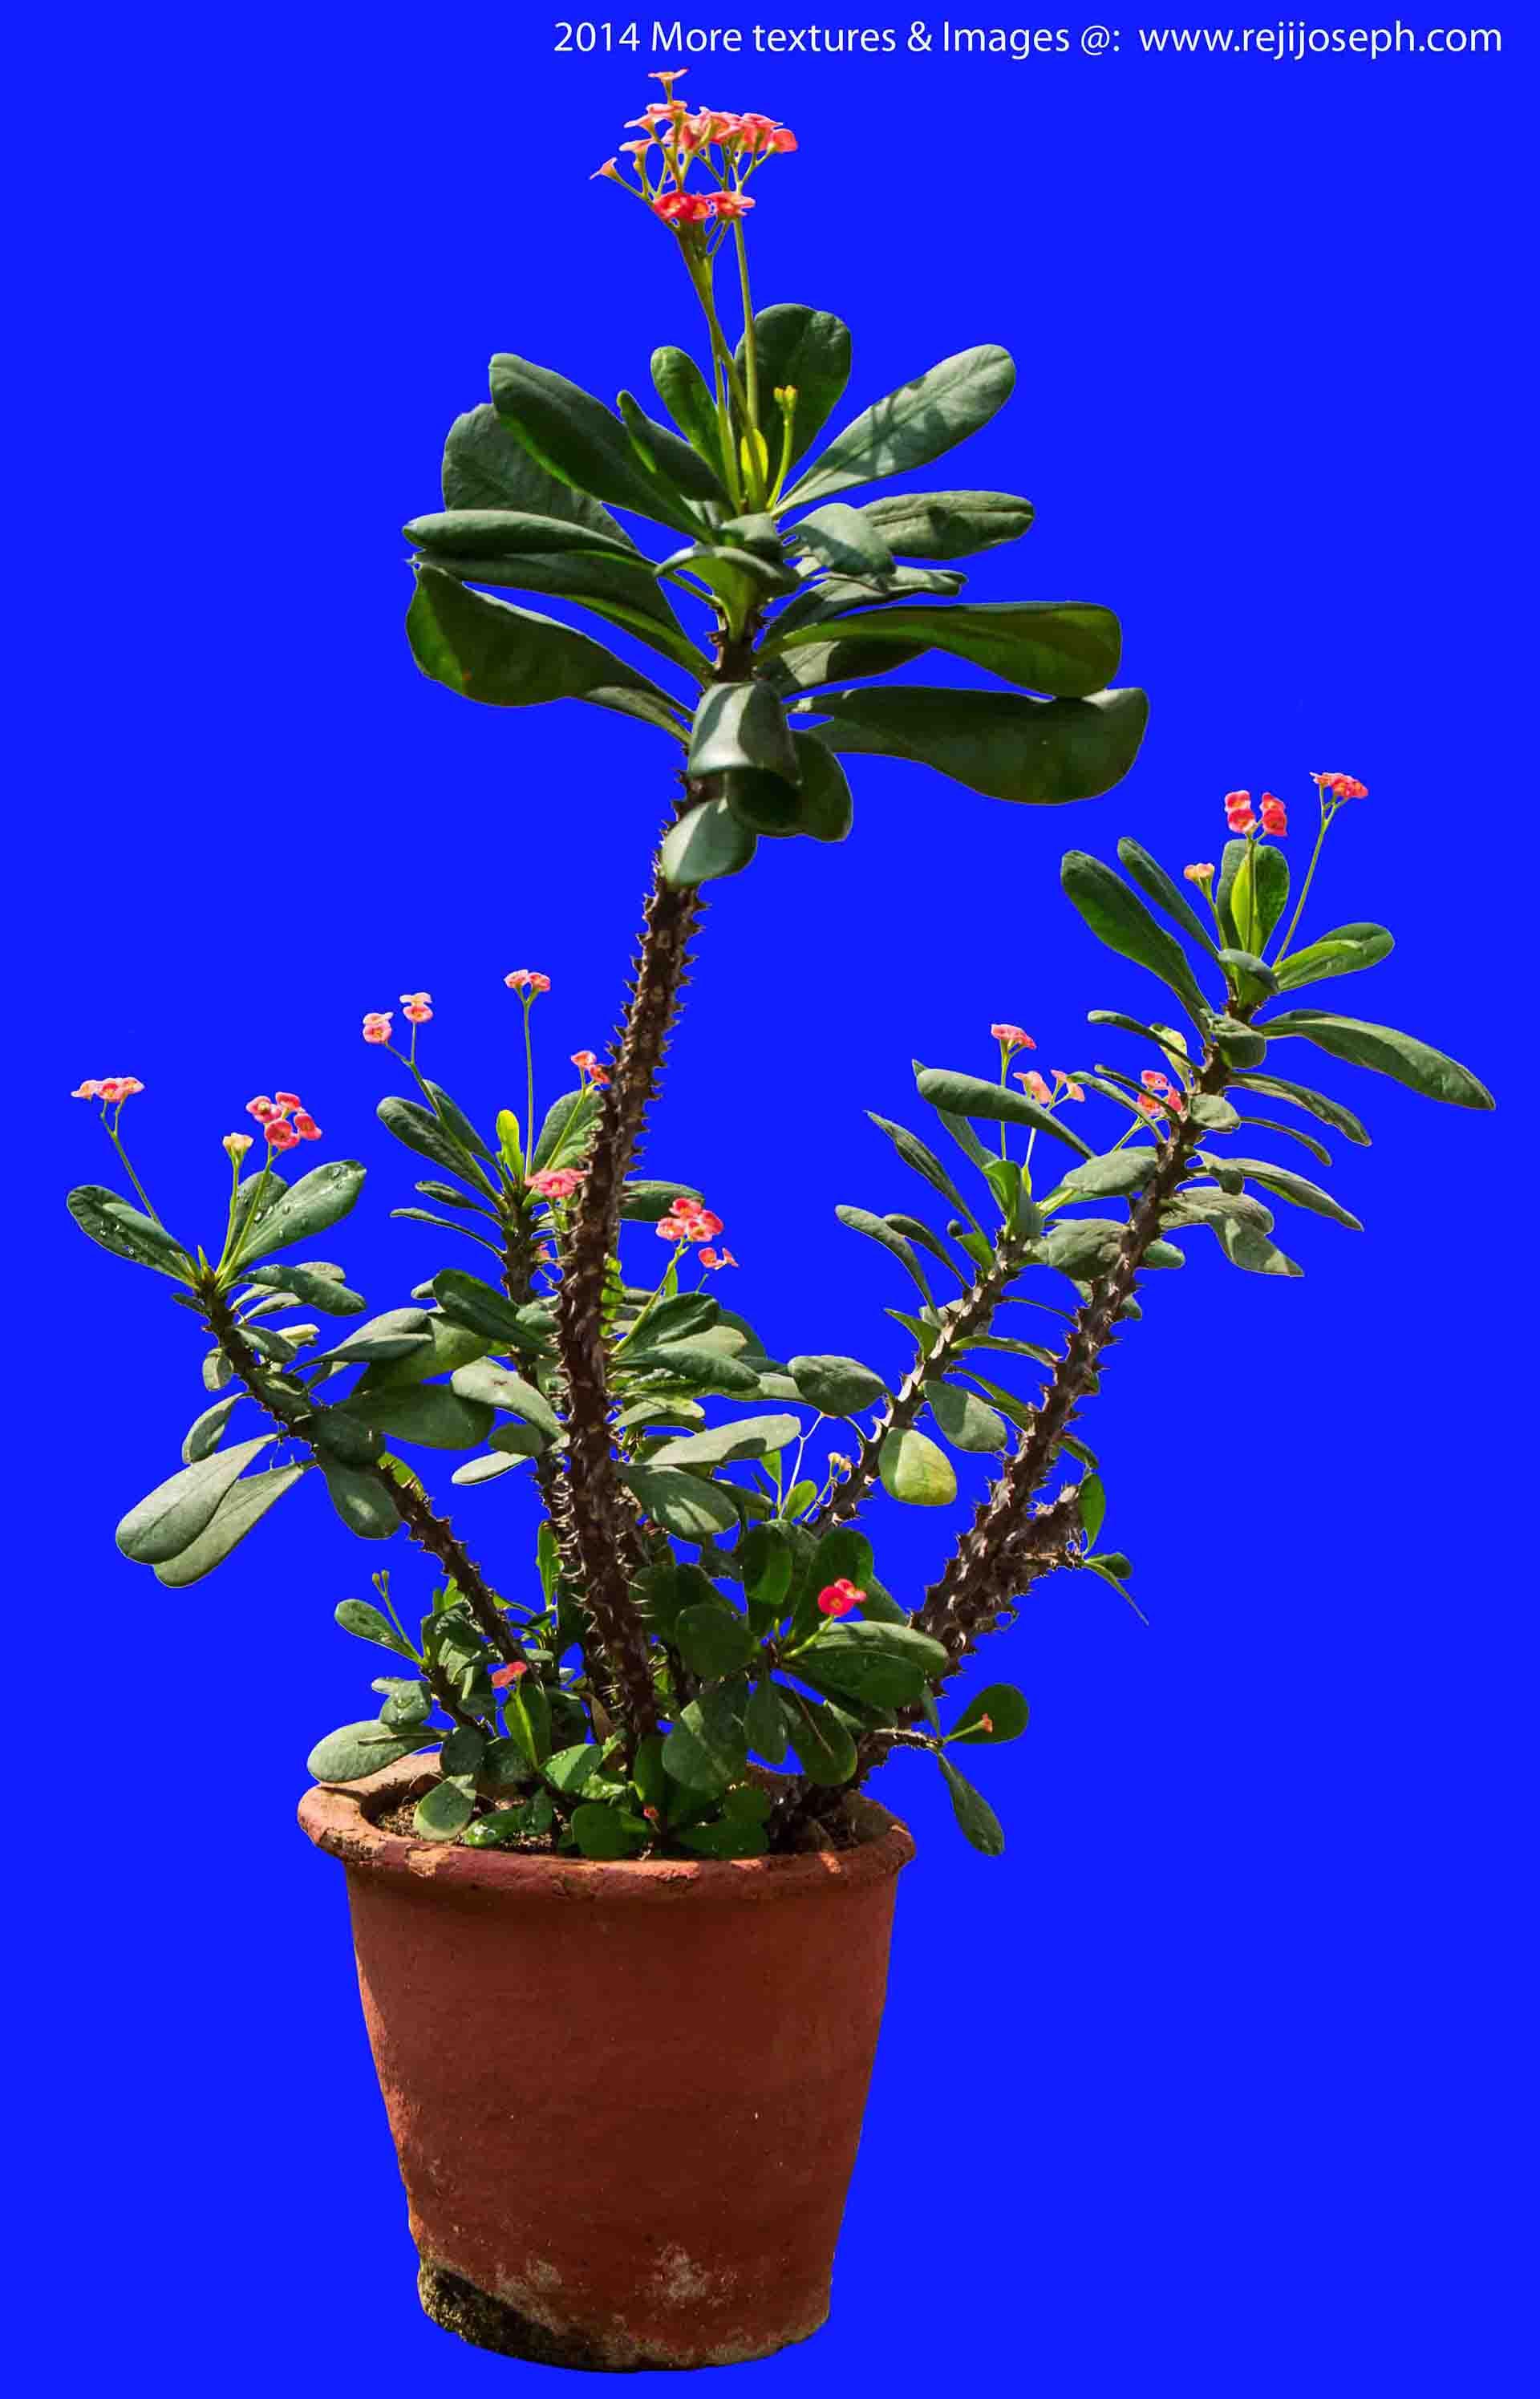 Euphorbia Milii garden plant 00002